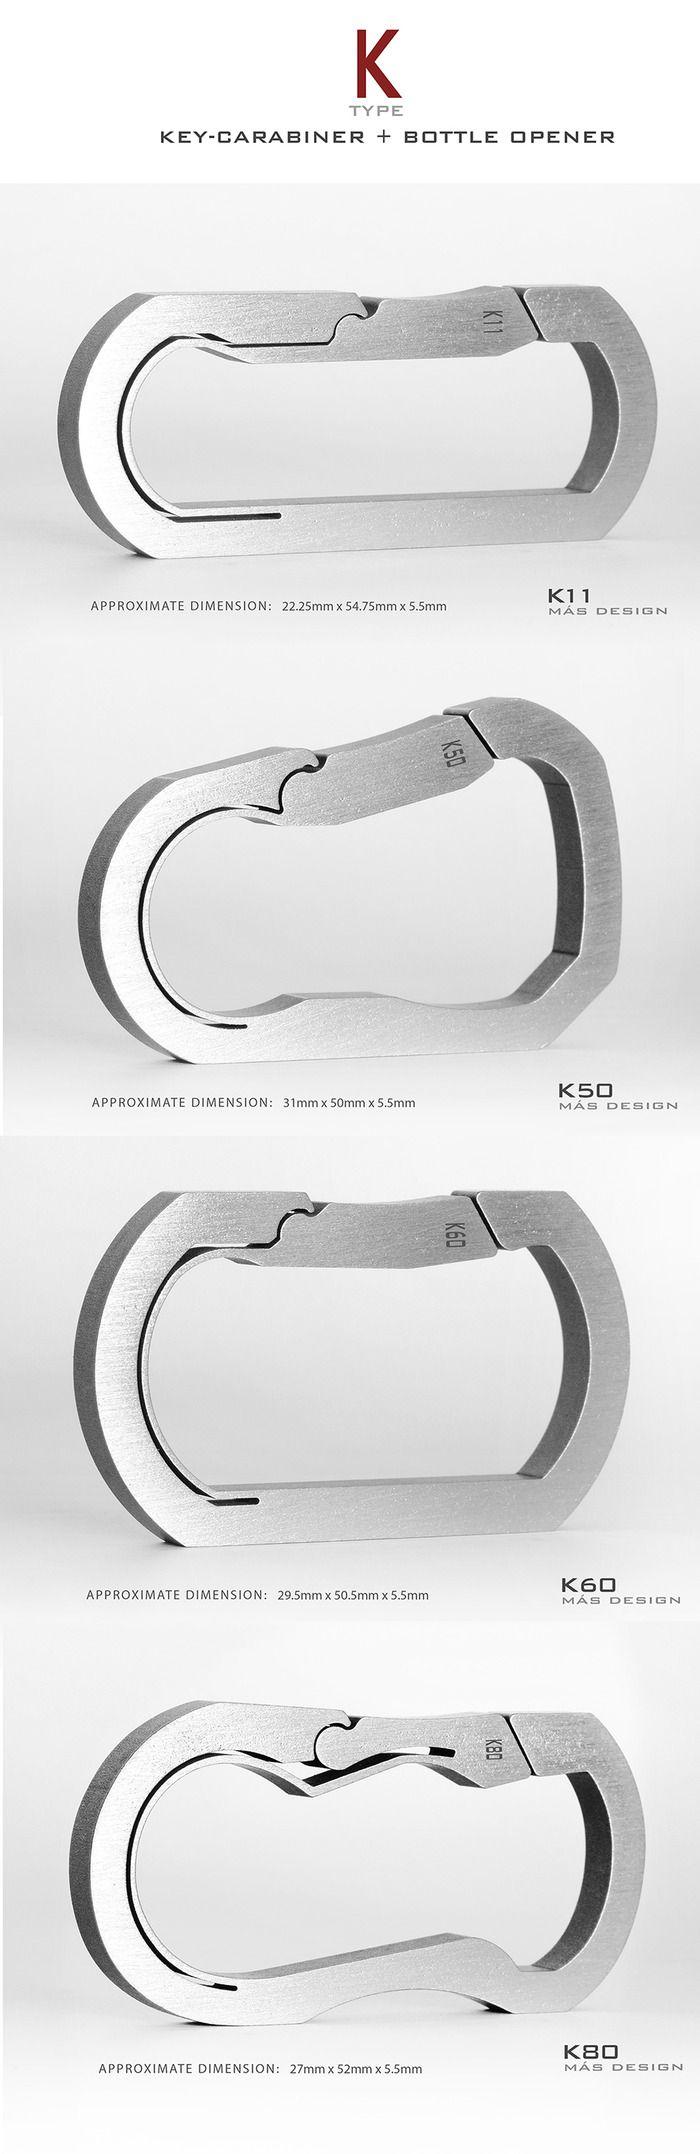 BAUHAUS: Titanium Keychain / Key Carabiner by THANASIT (SUNNY) INKAVESVAANIT — Kickstarter